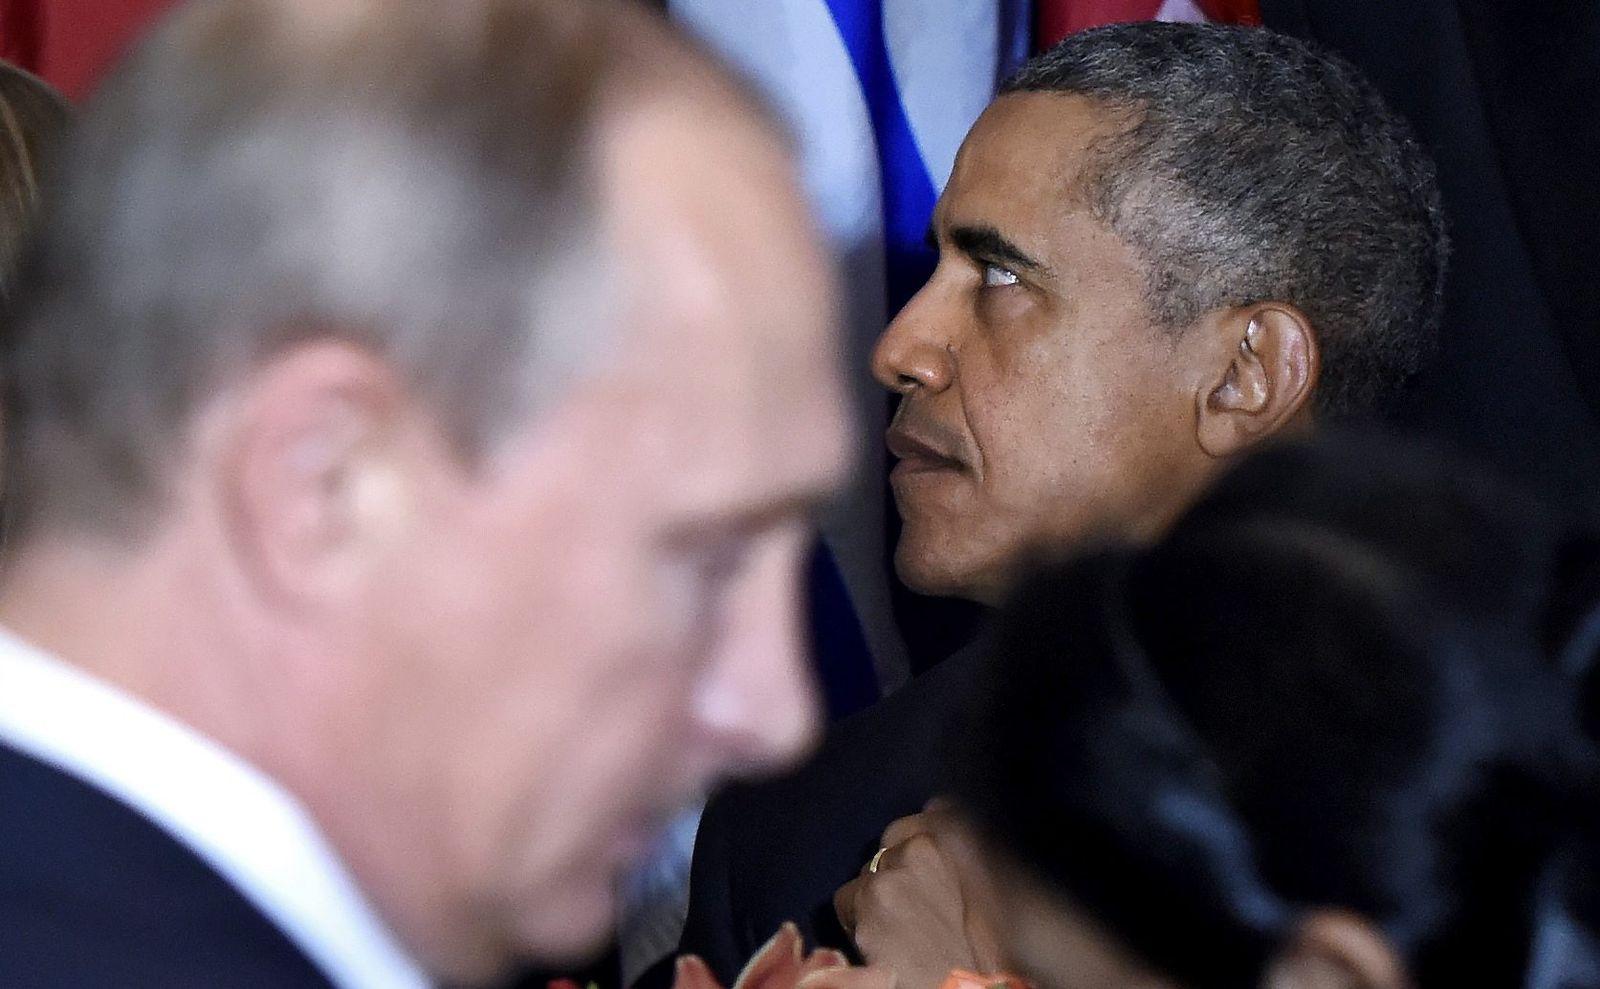 Wladimir Putin/ Barack Obama